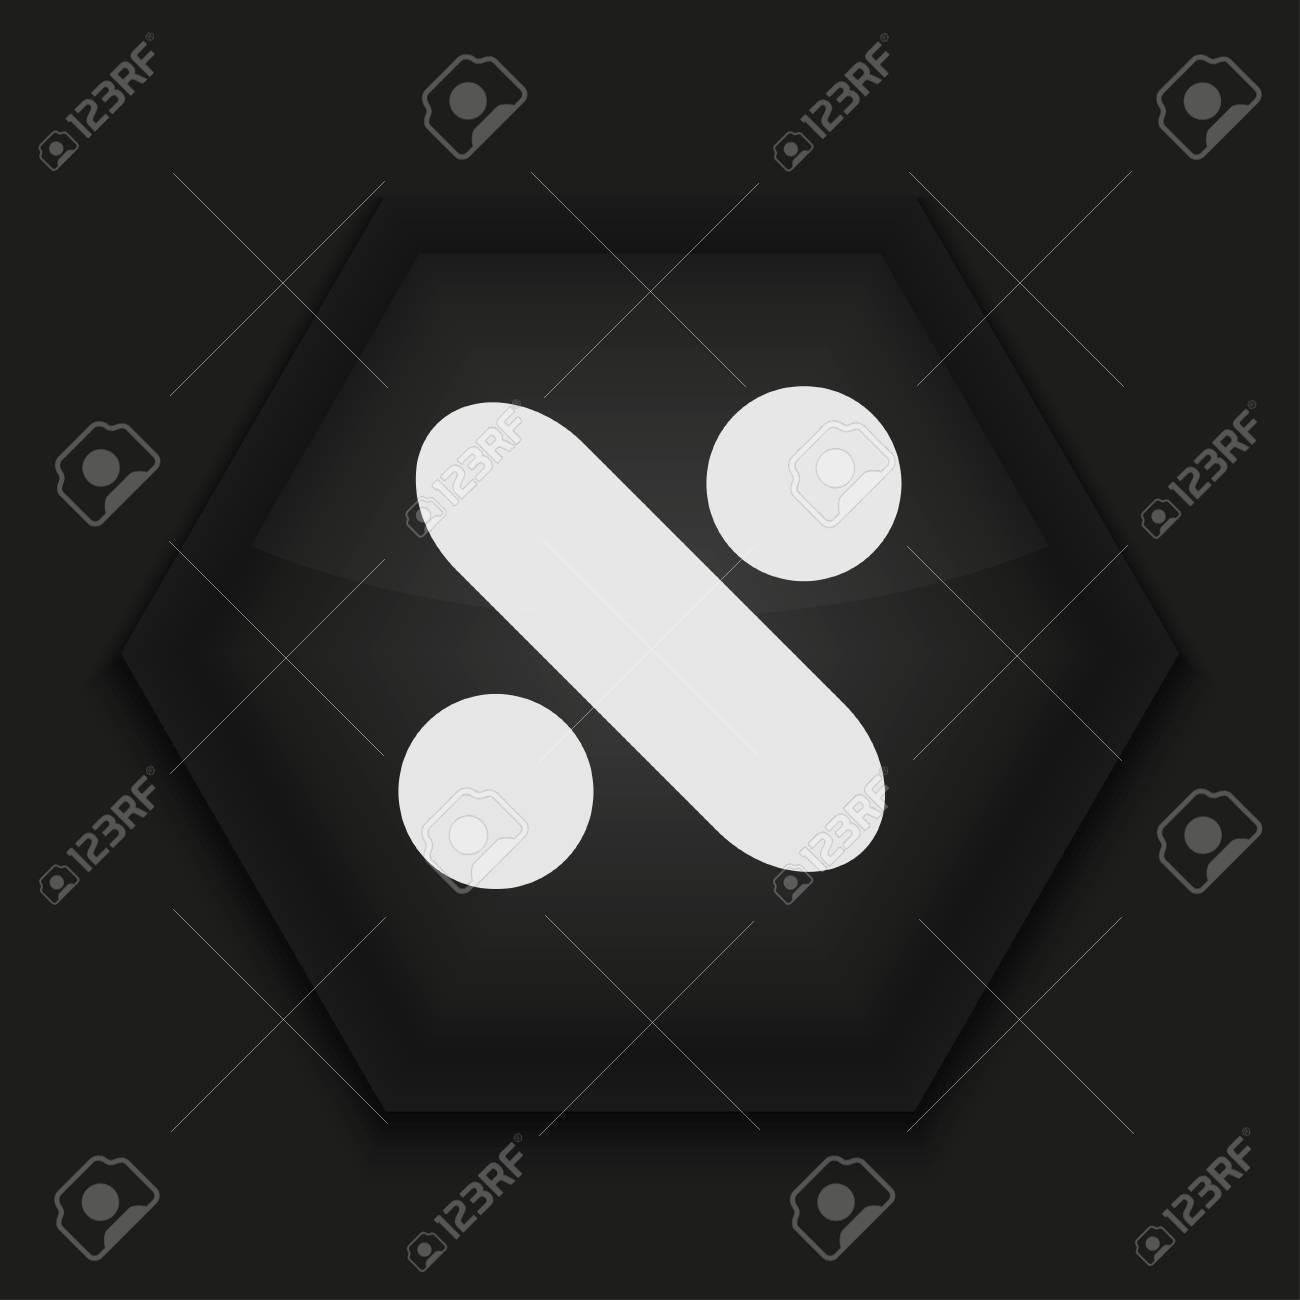 Vector creative icon on black background. Eps10 Stock Vector - 17273858